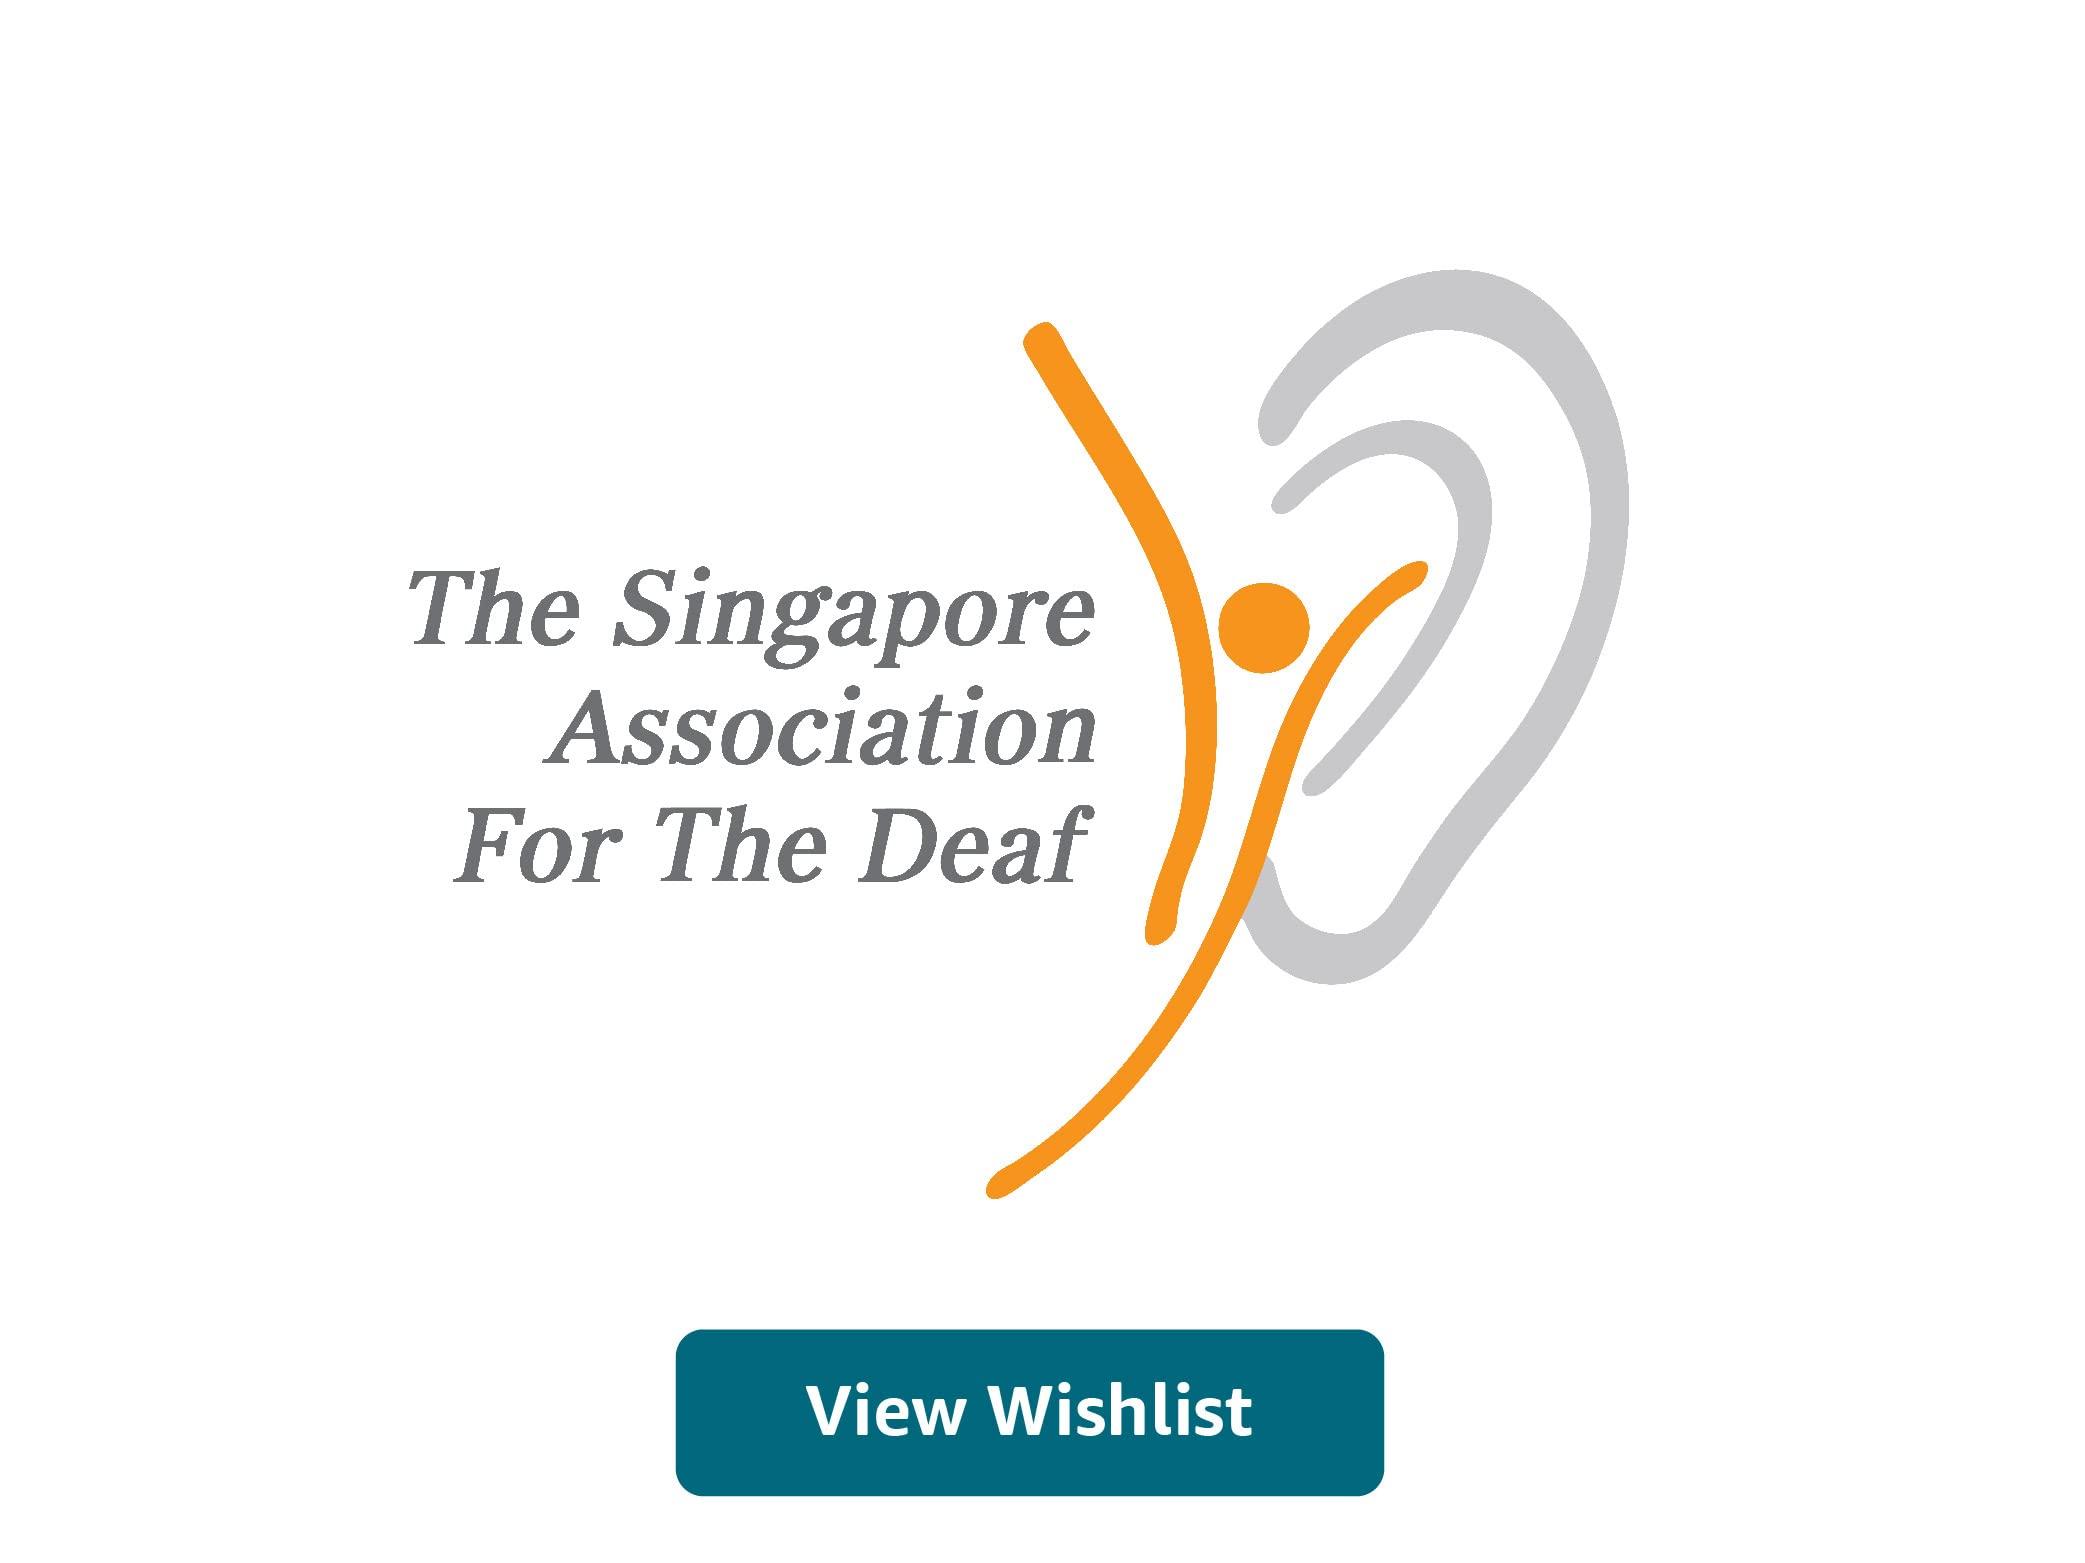 Singapore Association For The Deaf